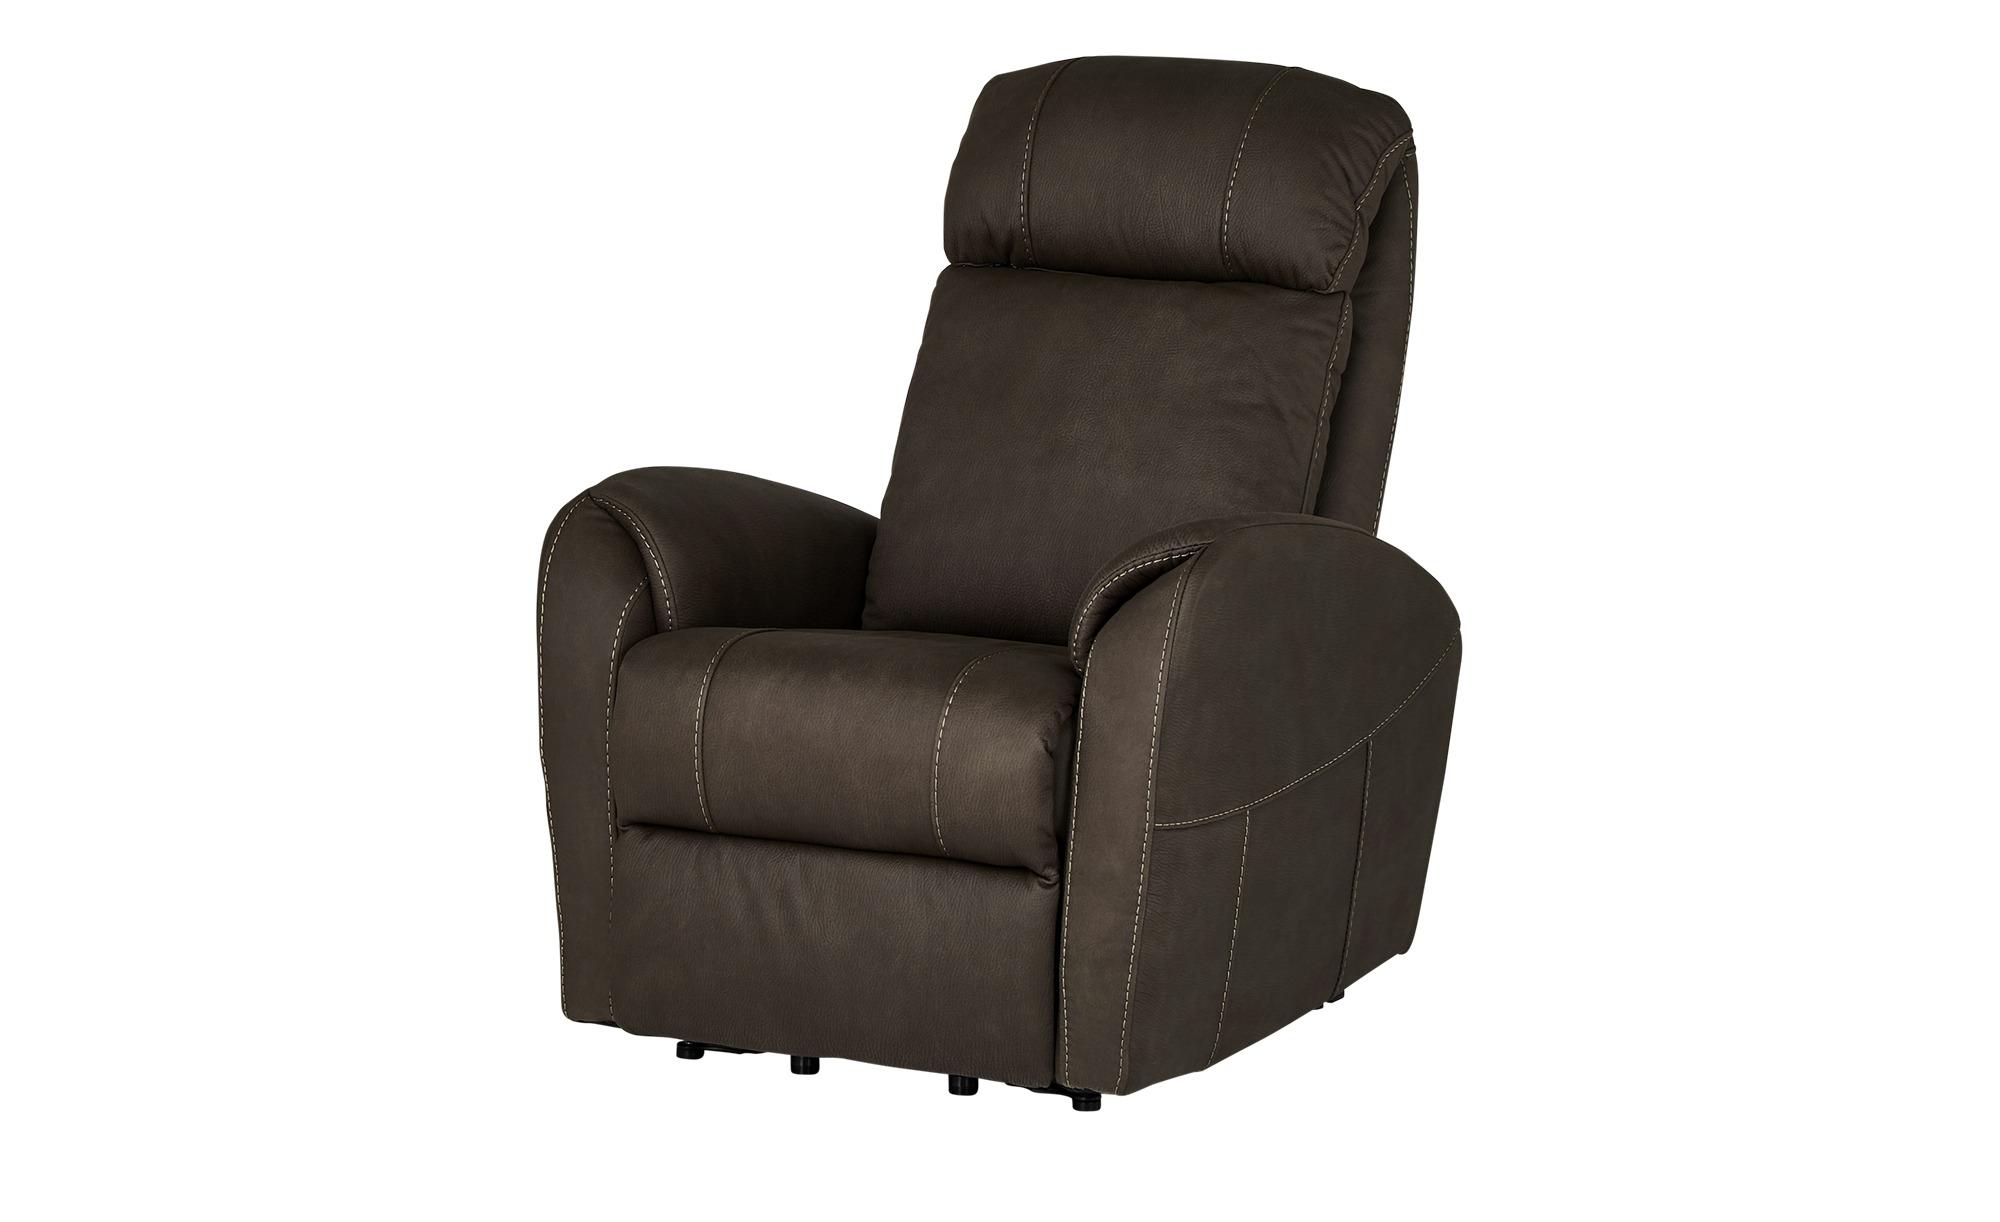 Fernsehsessel  Luis ¦ braun ¦ Maße (cm): B: 79 H: 104 T: 101 Polstermöbel > Sessel > Polstersessel - Höffner